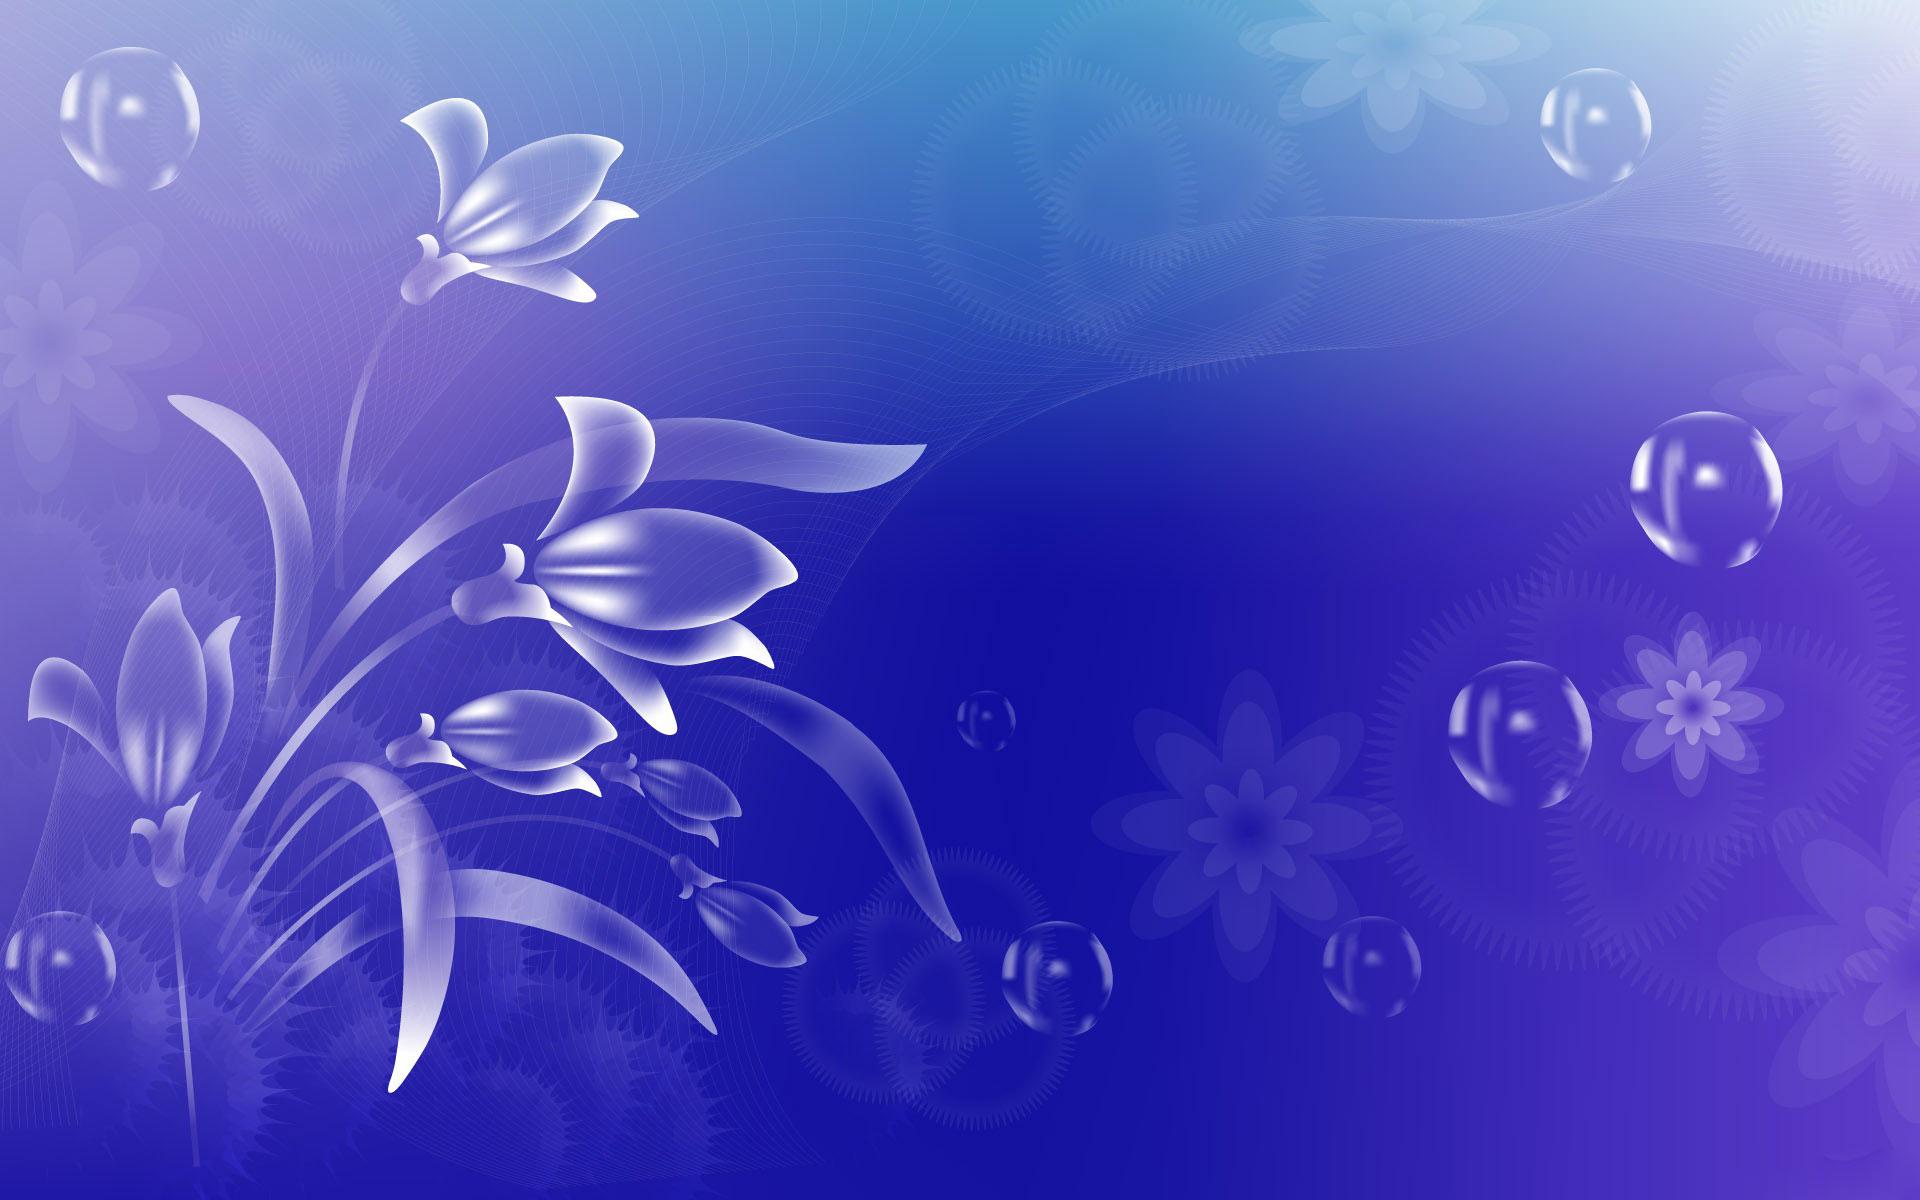 Neon wallpaper   Vector Art flowers background jpg Wallpapers   HD 1920x1200